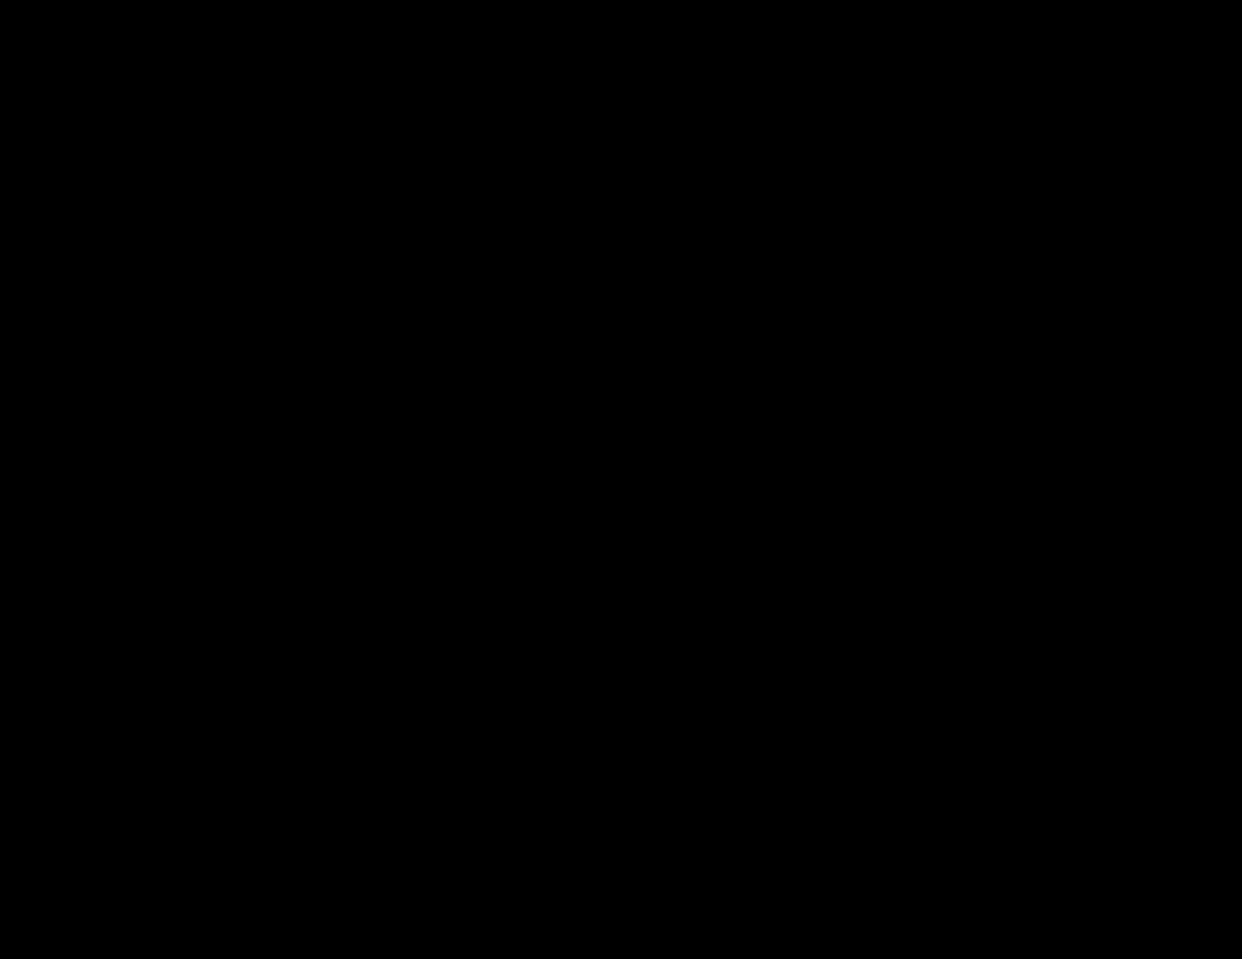 2017 ford firewall insulator  insulator